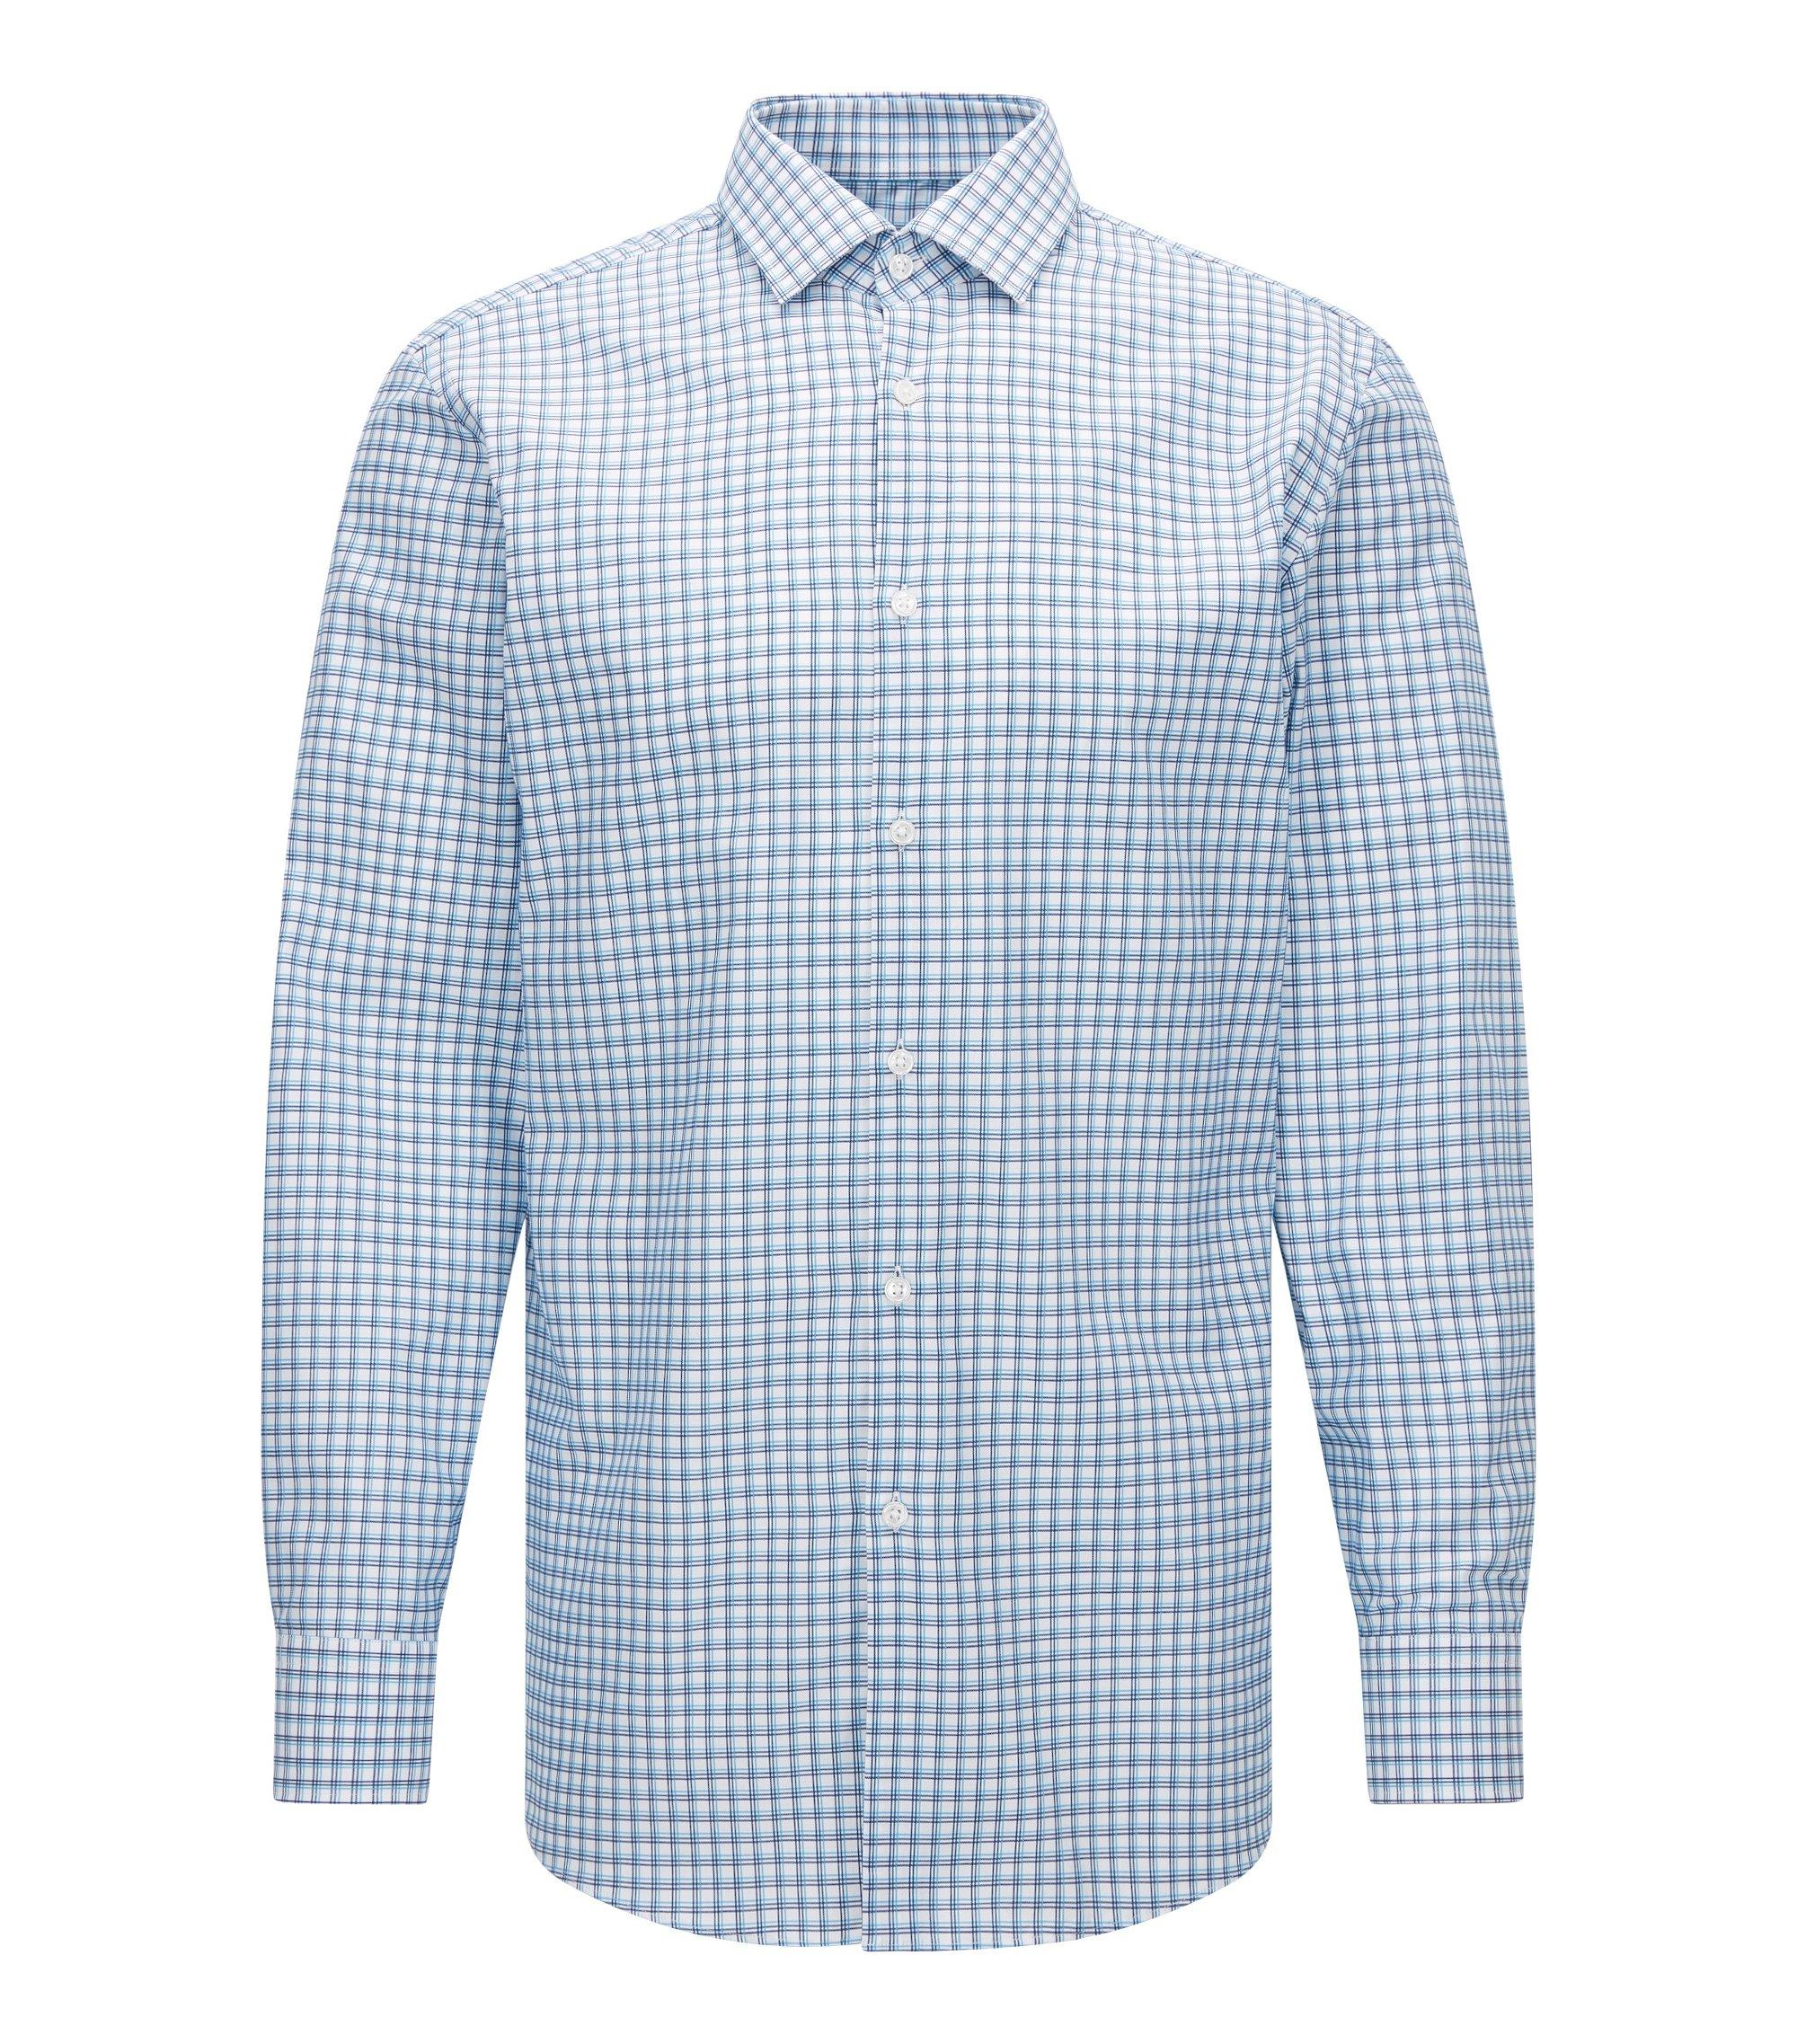 Tattersall Cotton Dress Shirt, Sharp Fit   Marley US, Turquoise